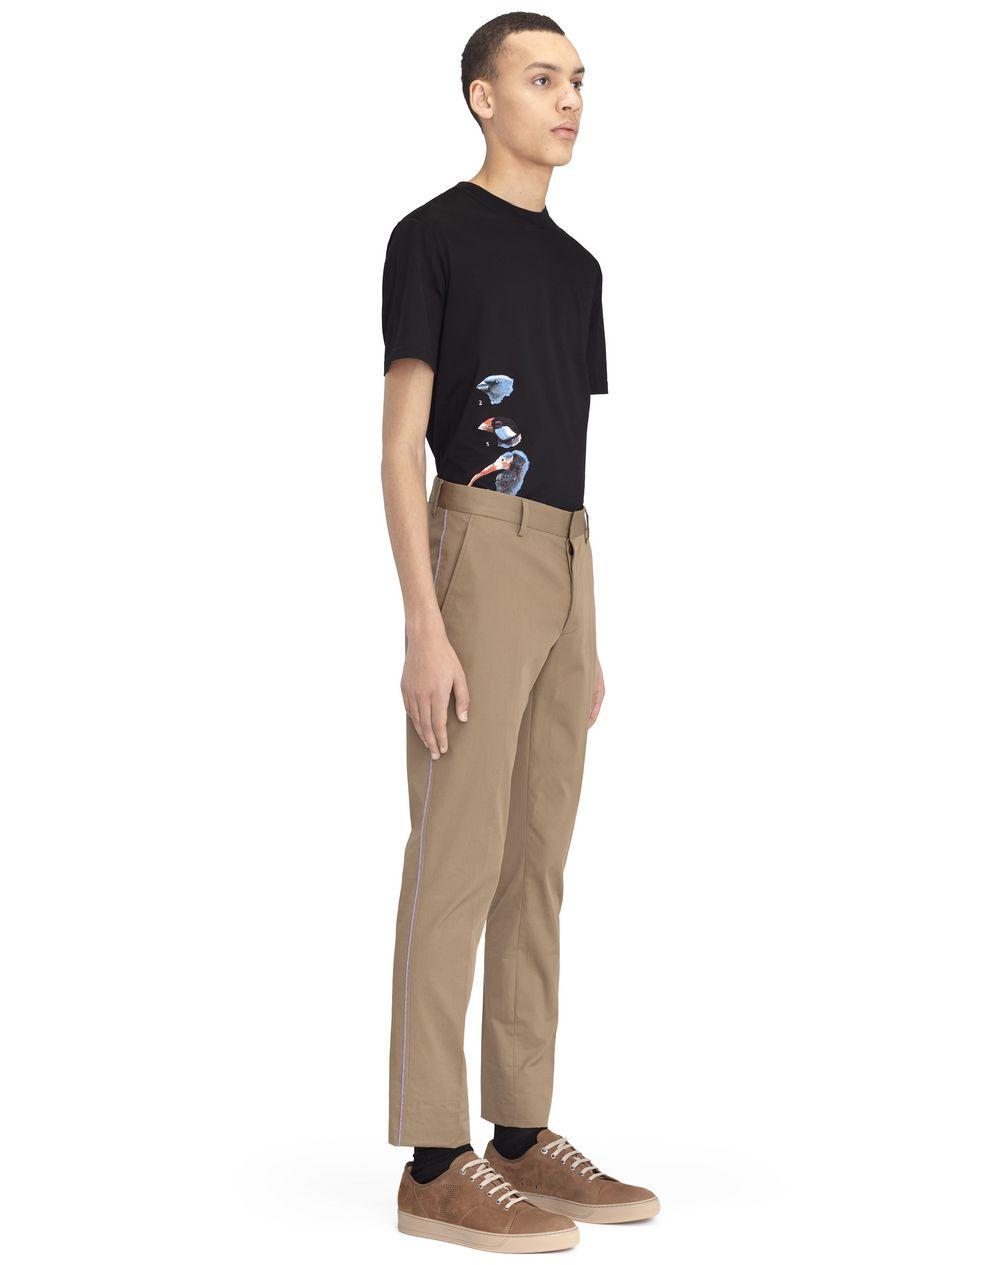 BEIGE CHINO PANTS - Lanvin